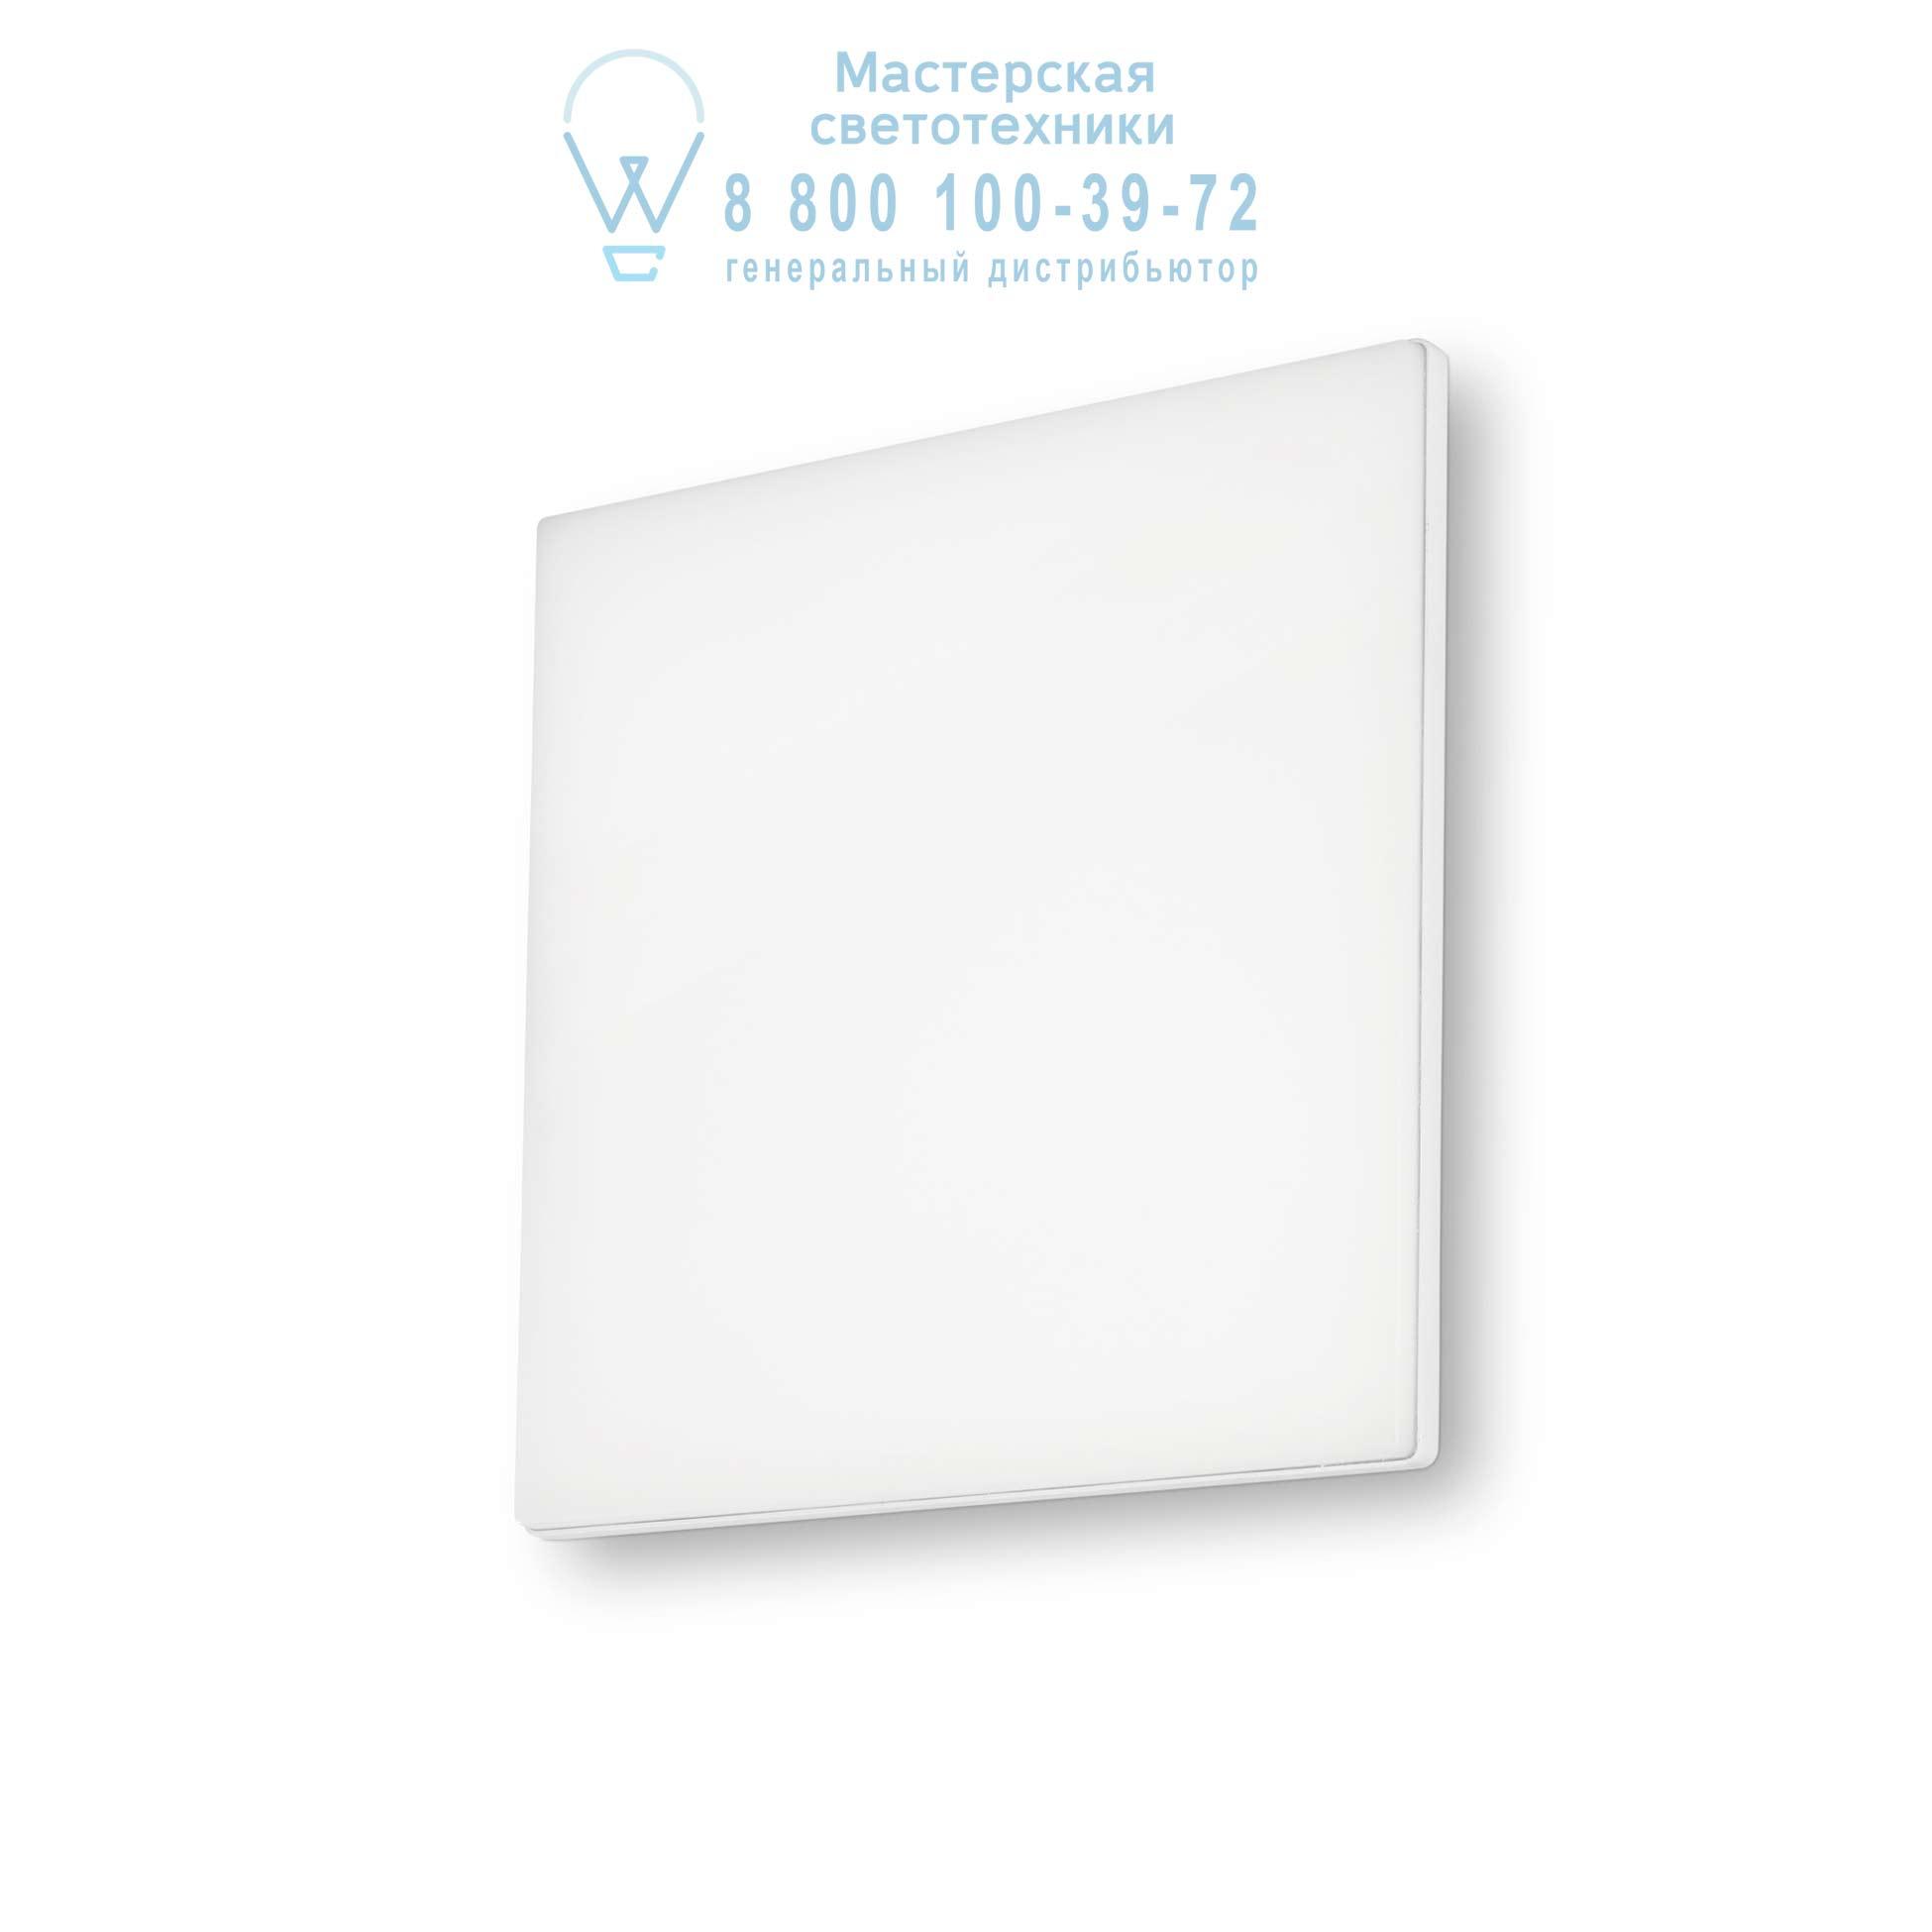 MIB PL1 SQUARE уличный потолочный светильник белый